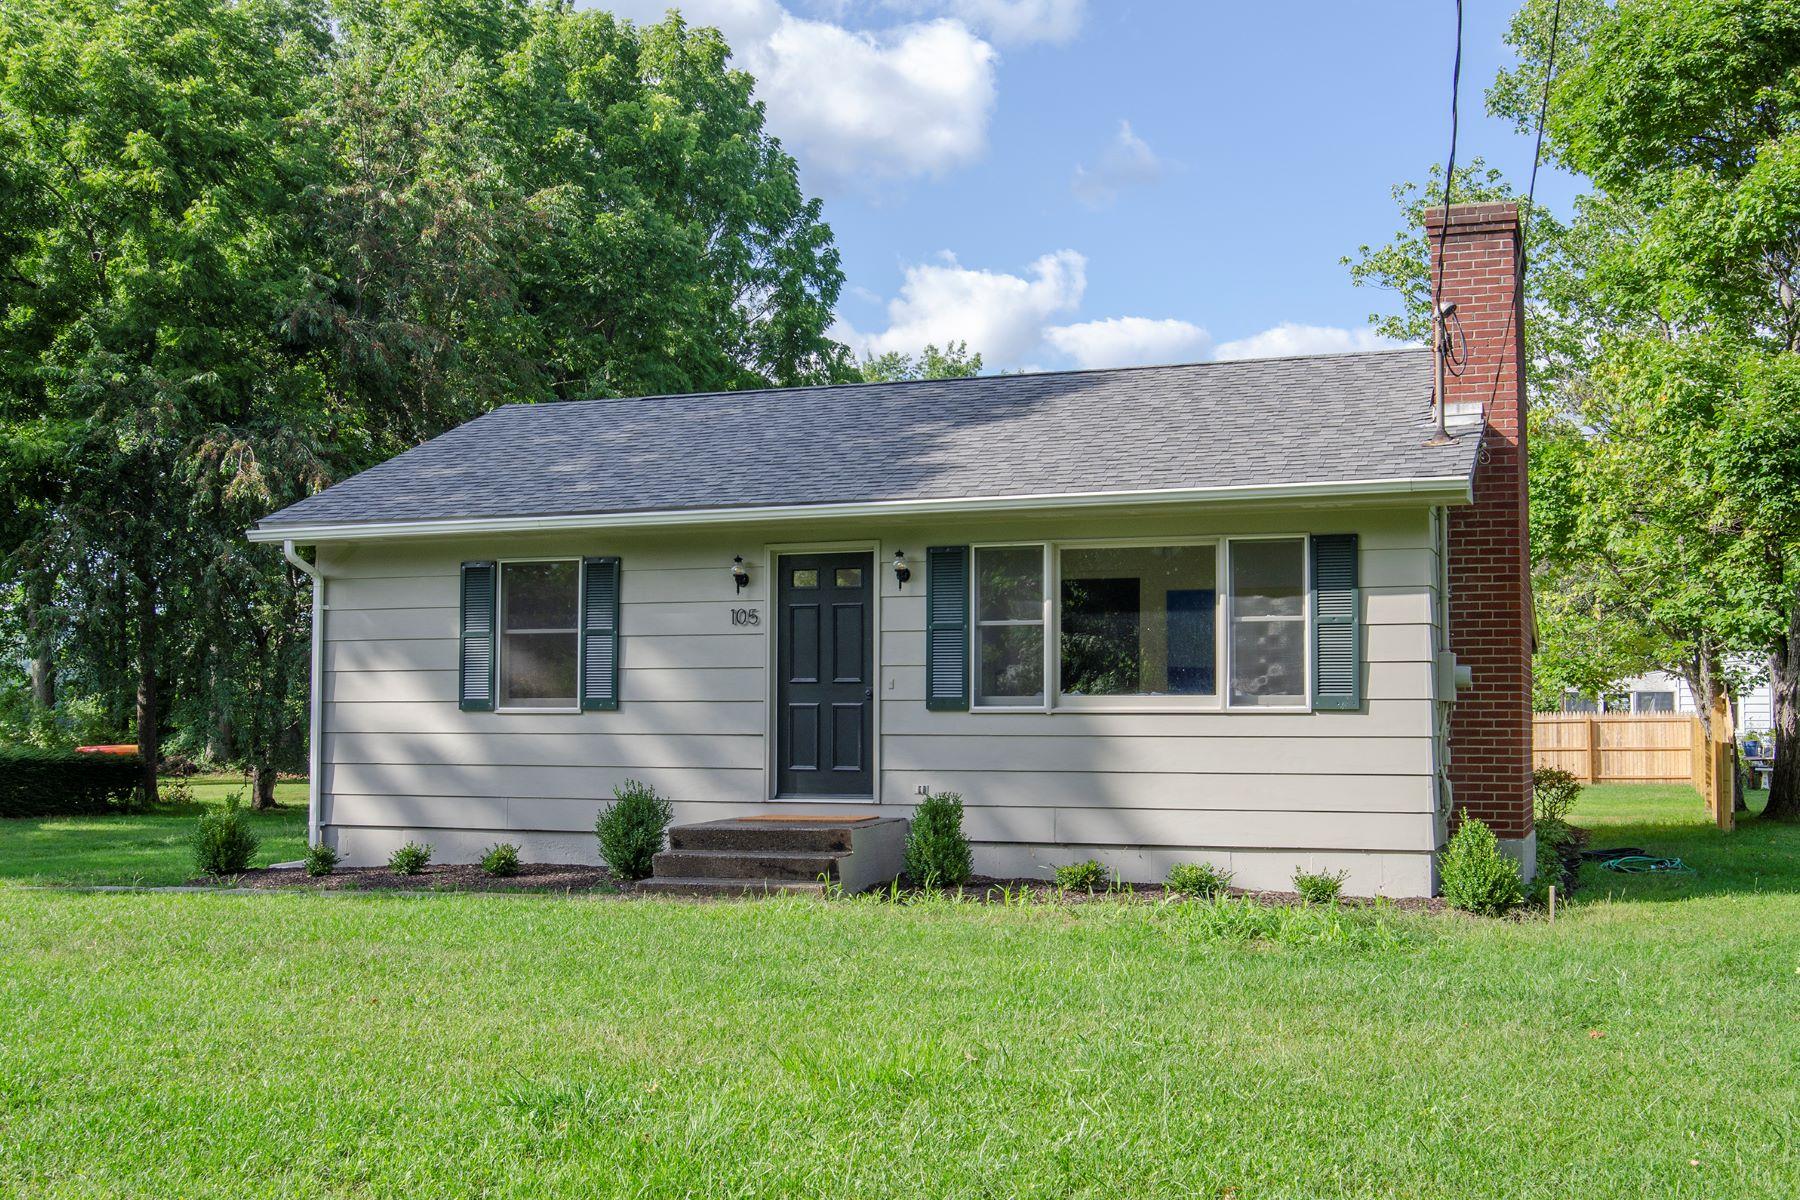 Single Family Homes for Active at Lake Living Perfection 105 Lake Shore Copake, New York 12517 United States